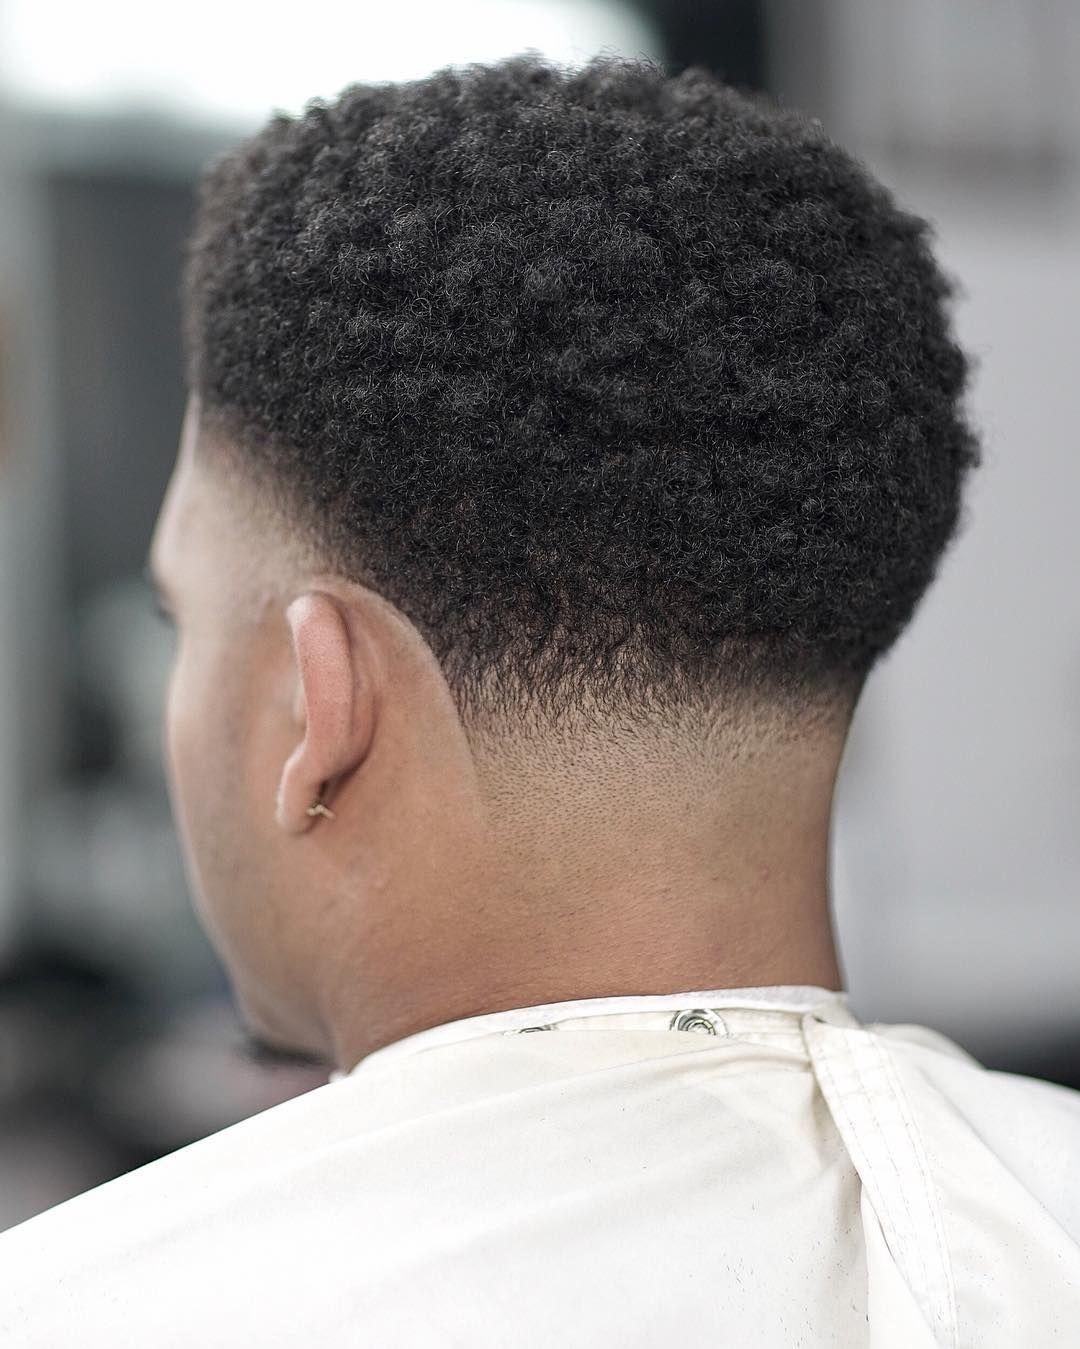 Pattycuts High Taper Haircut 2017 Menshairstyles Menshaircuts